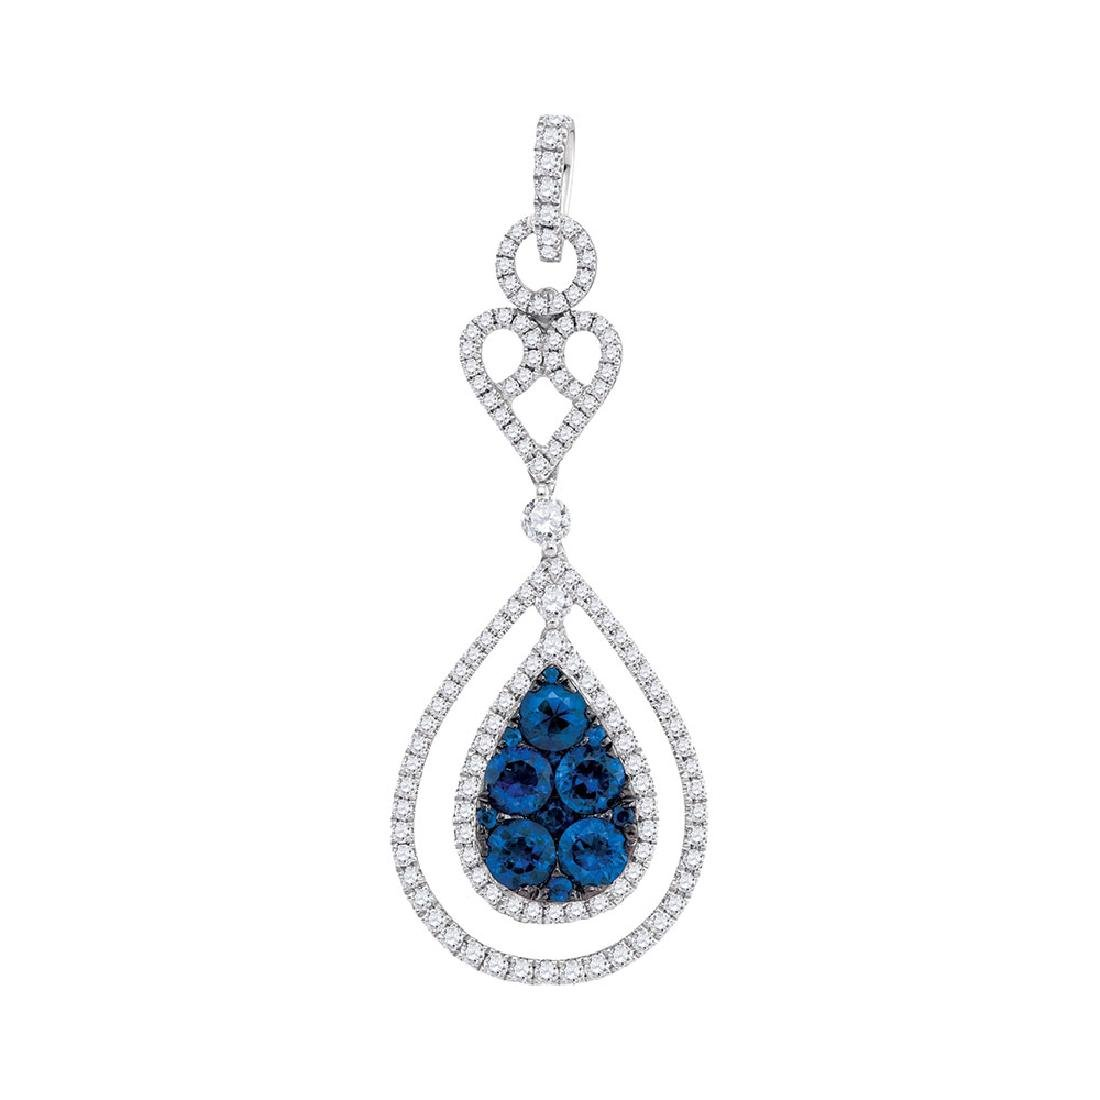 0.82 CTW Blue Sapphire Teardrop Diamond Pendant 14KT